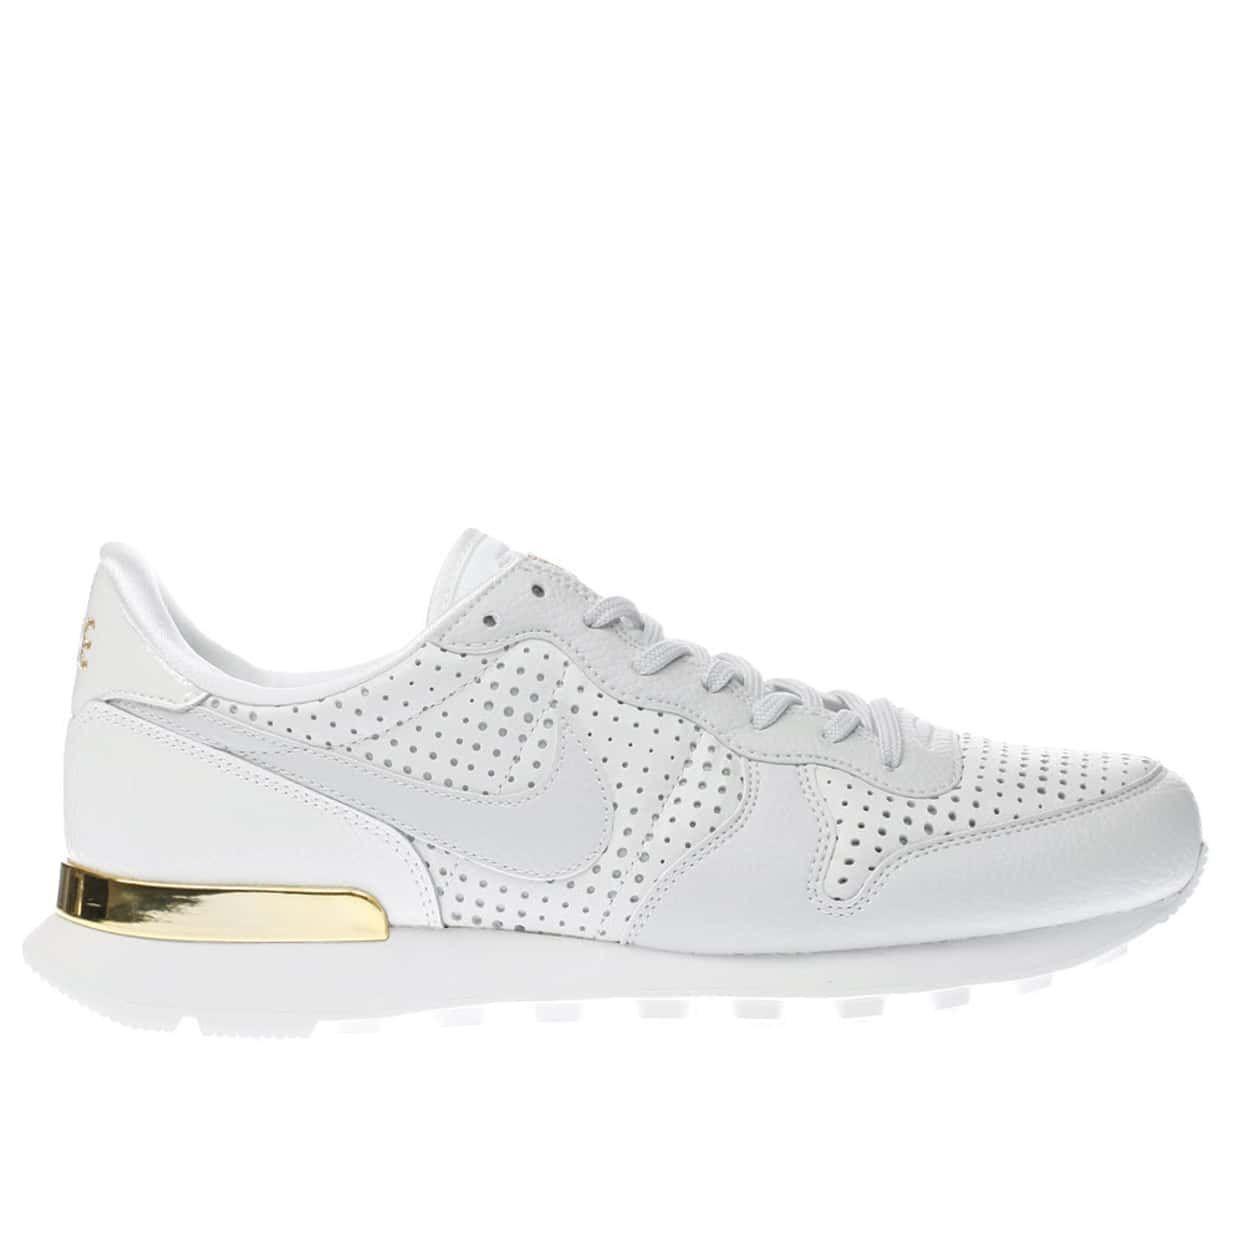 Womens Nike Beautiful X Internationalist Trainers White & Gold